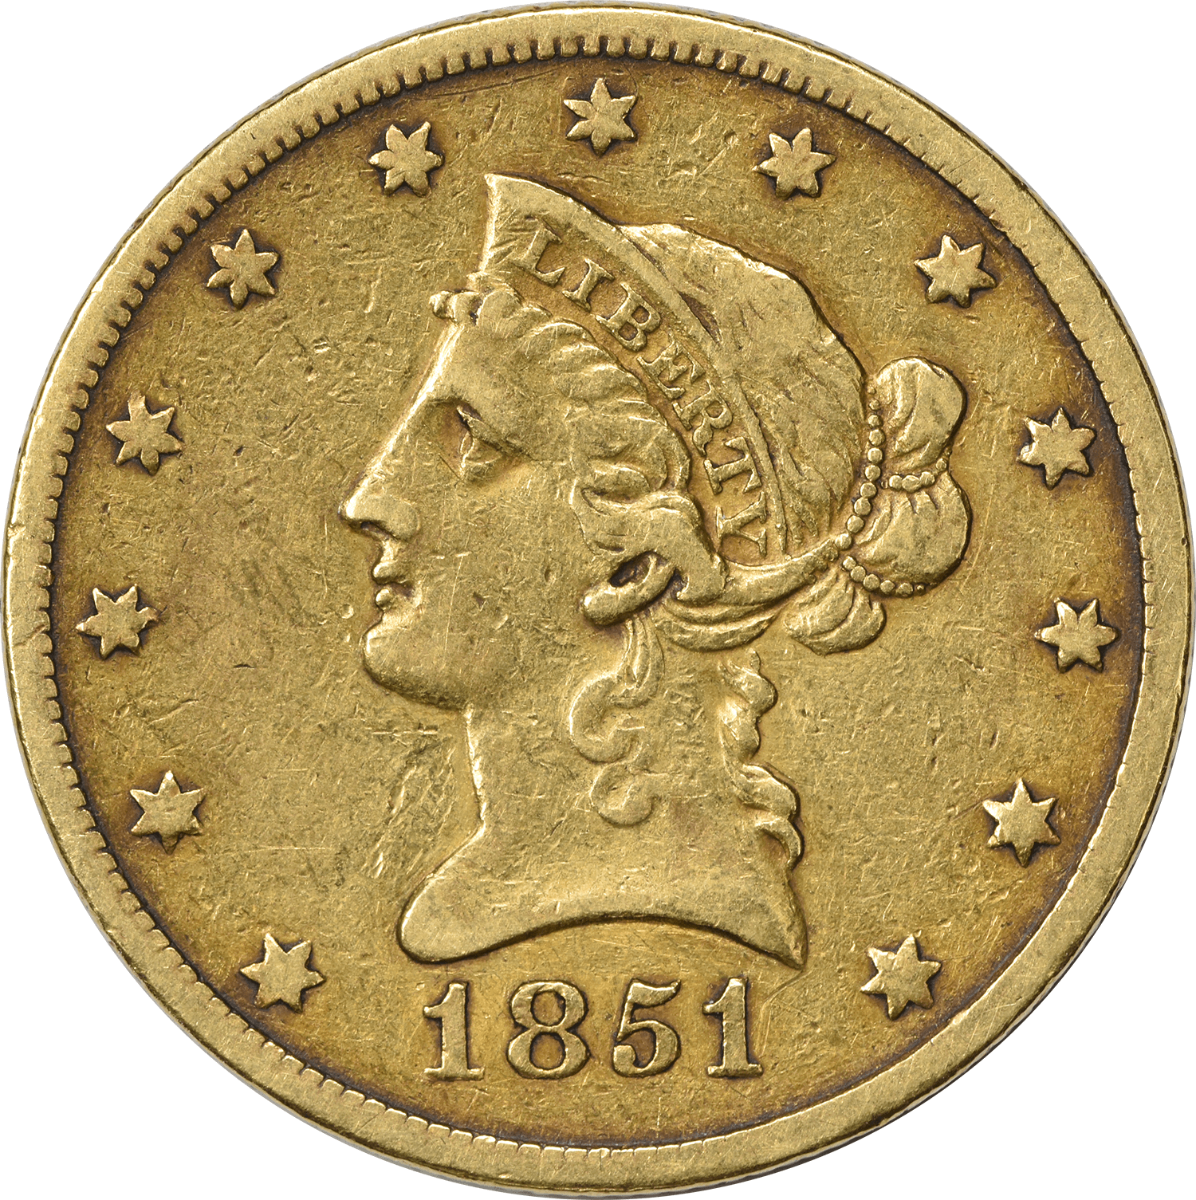 1851-O $10 Gold, EF, Uncertified, Liberty